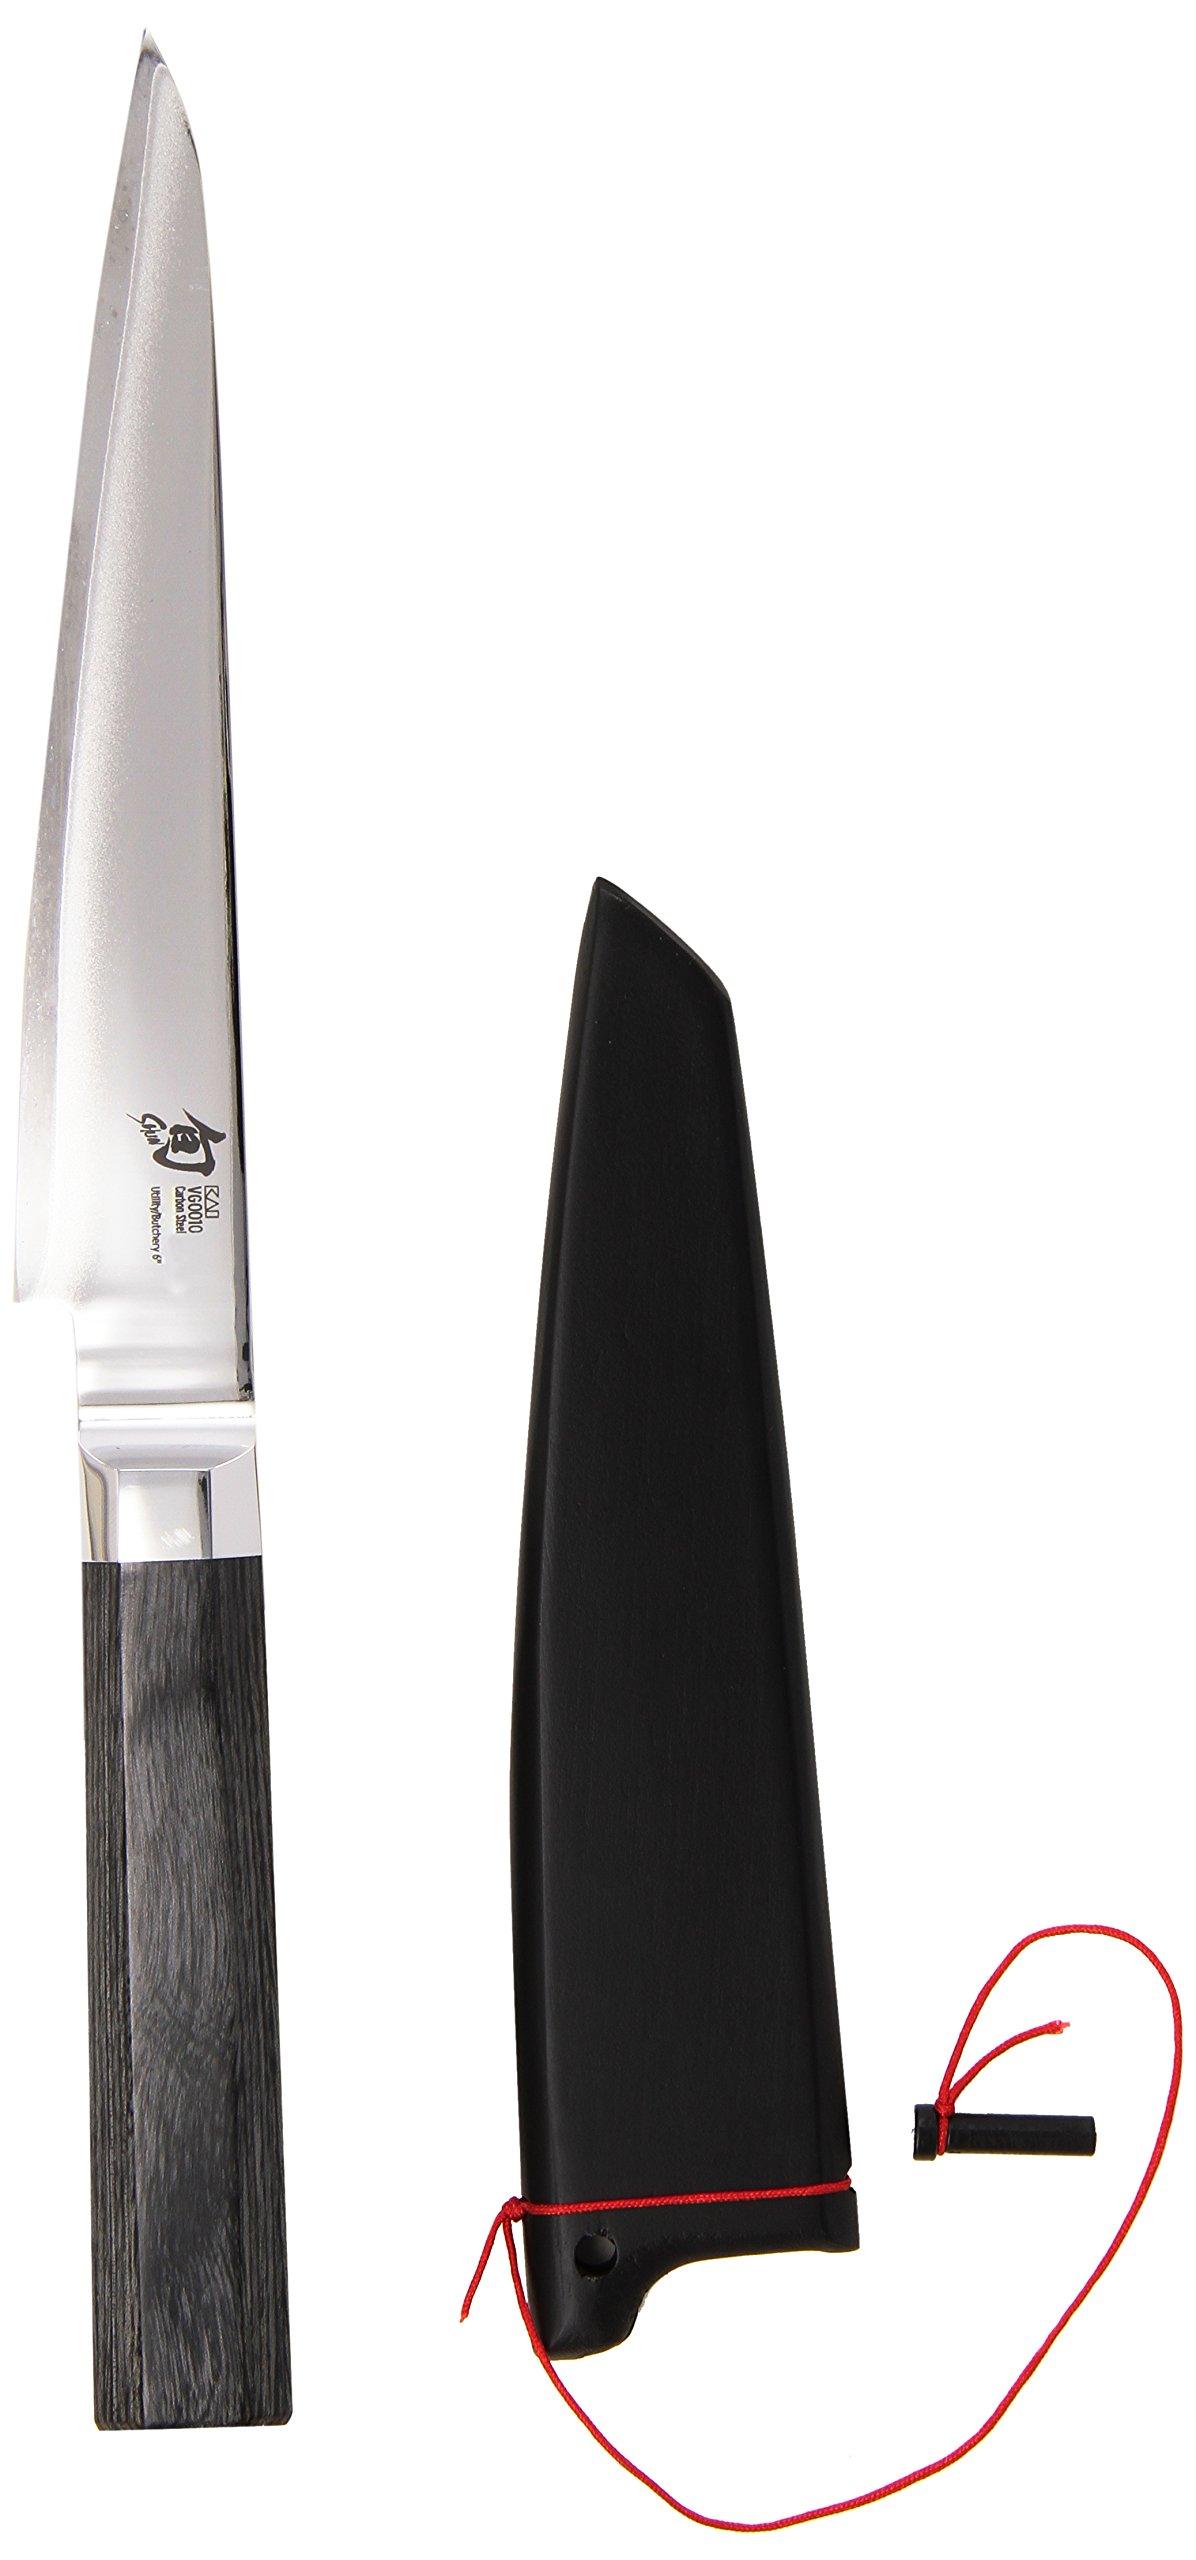 Shun VG0010 Blue Steel 6-Inch Utility/Butchery Knife